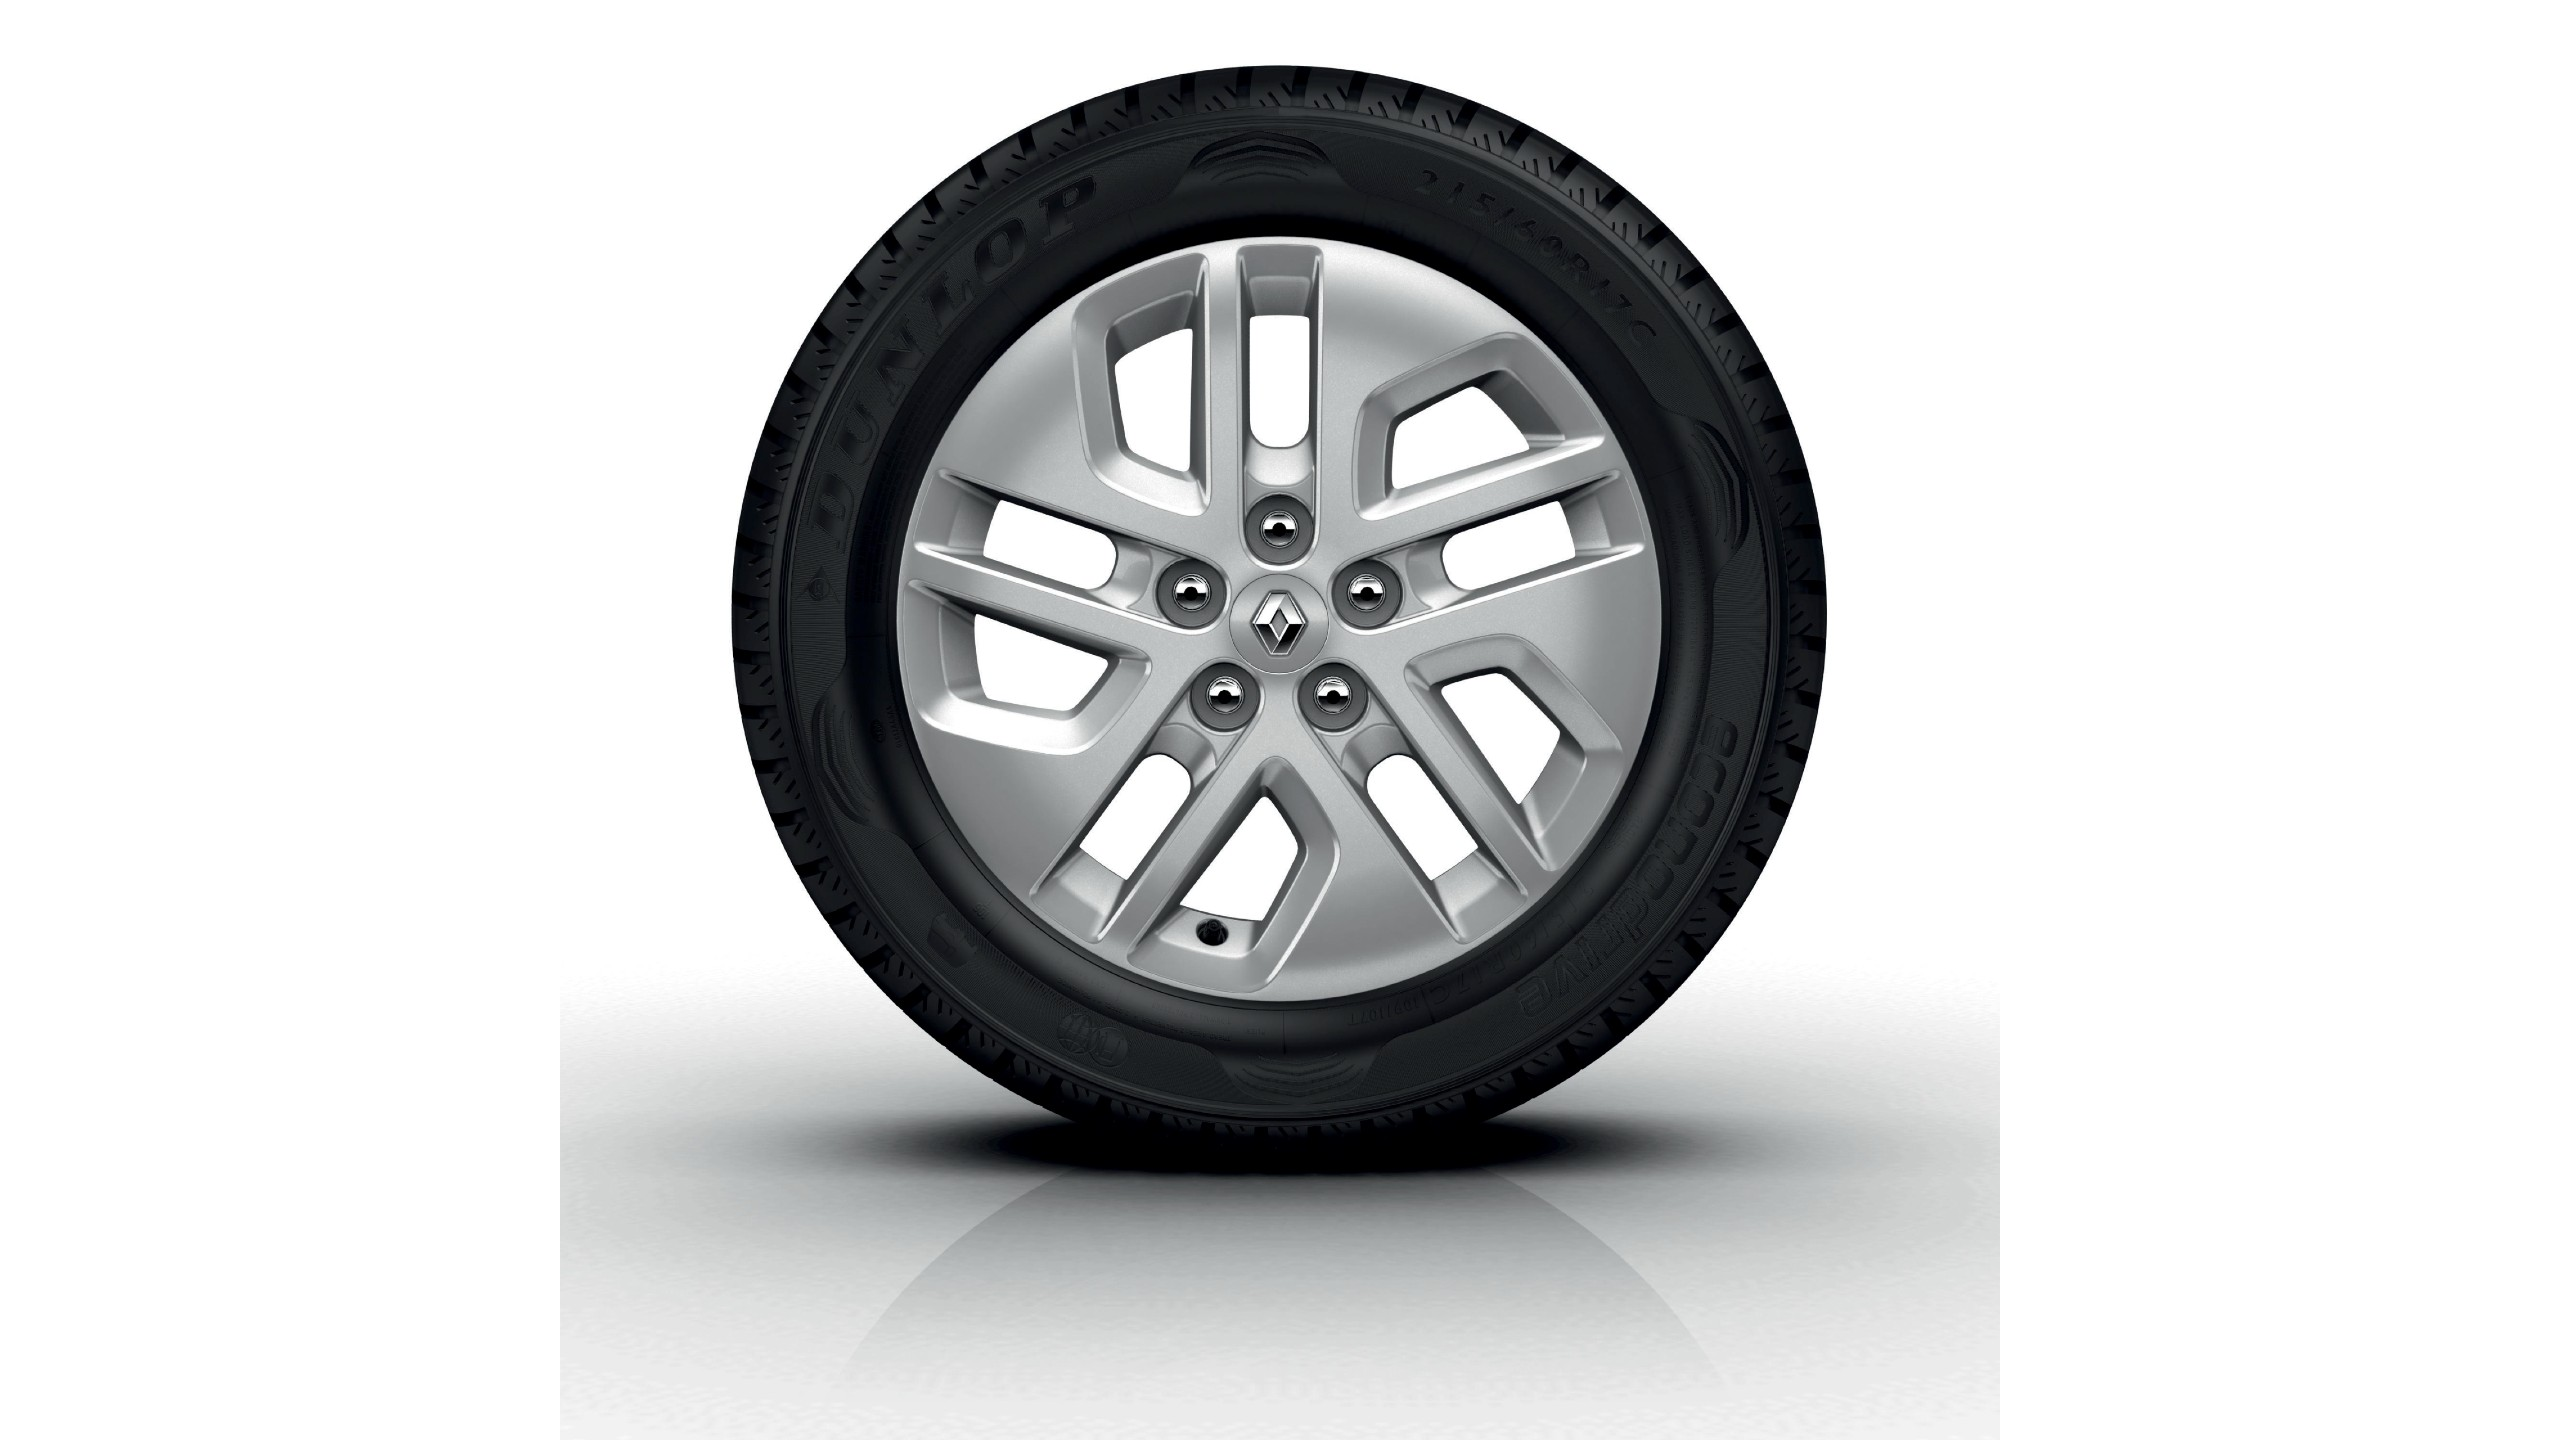 Alloy wheel hub